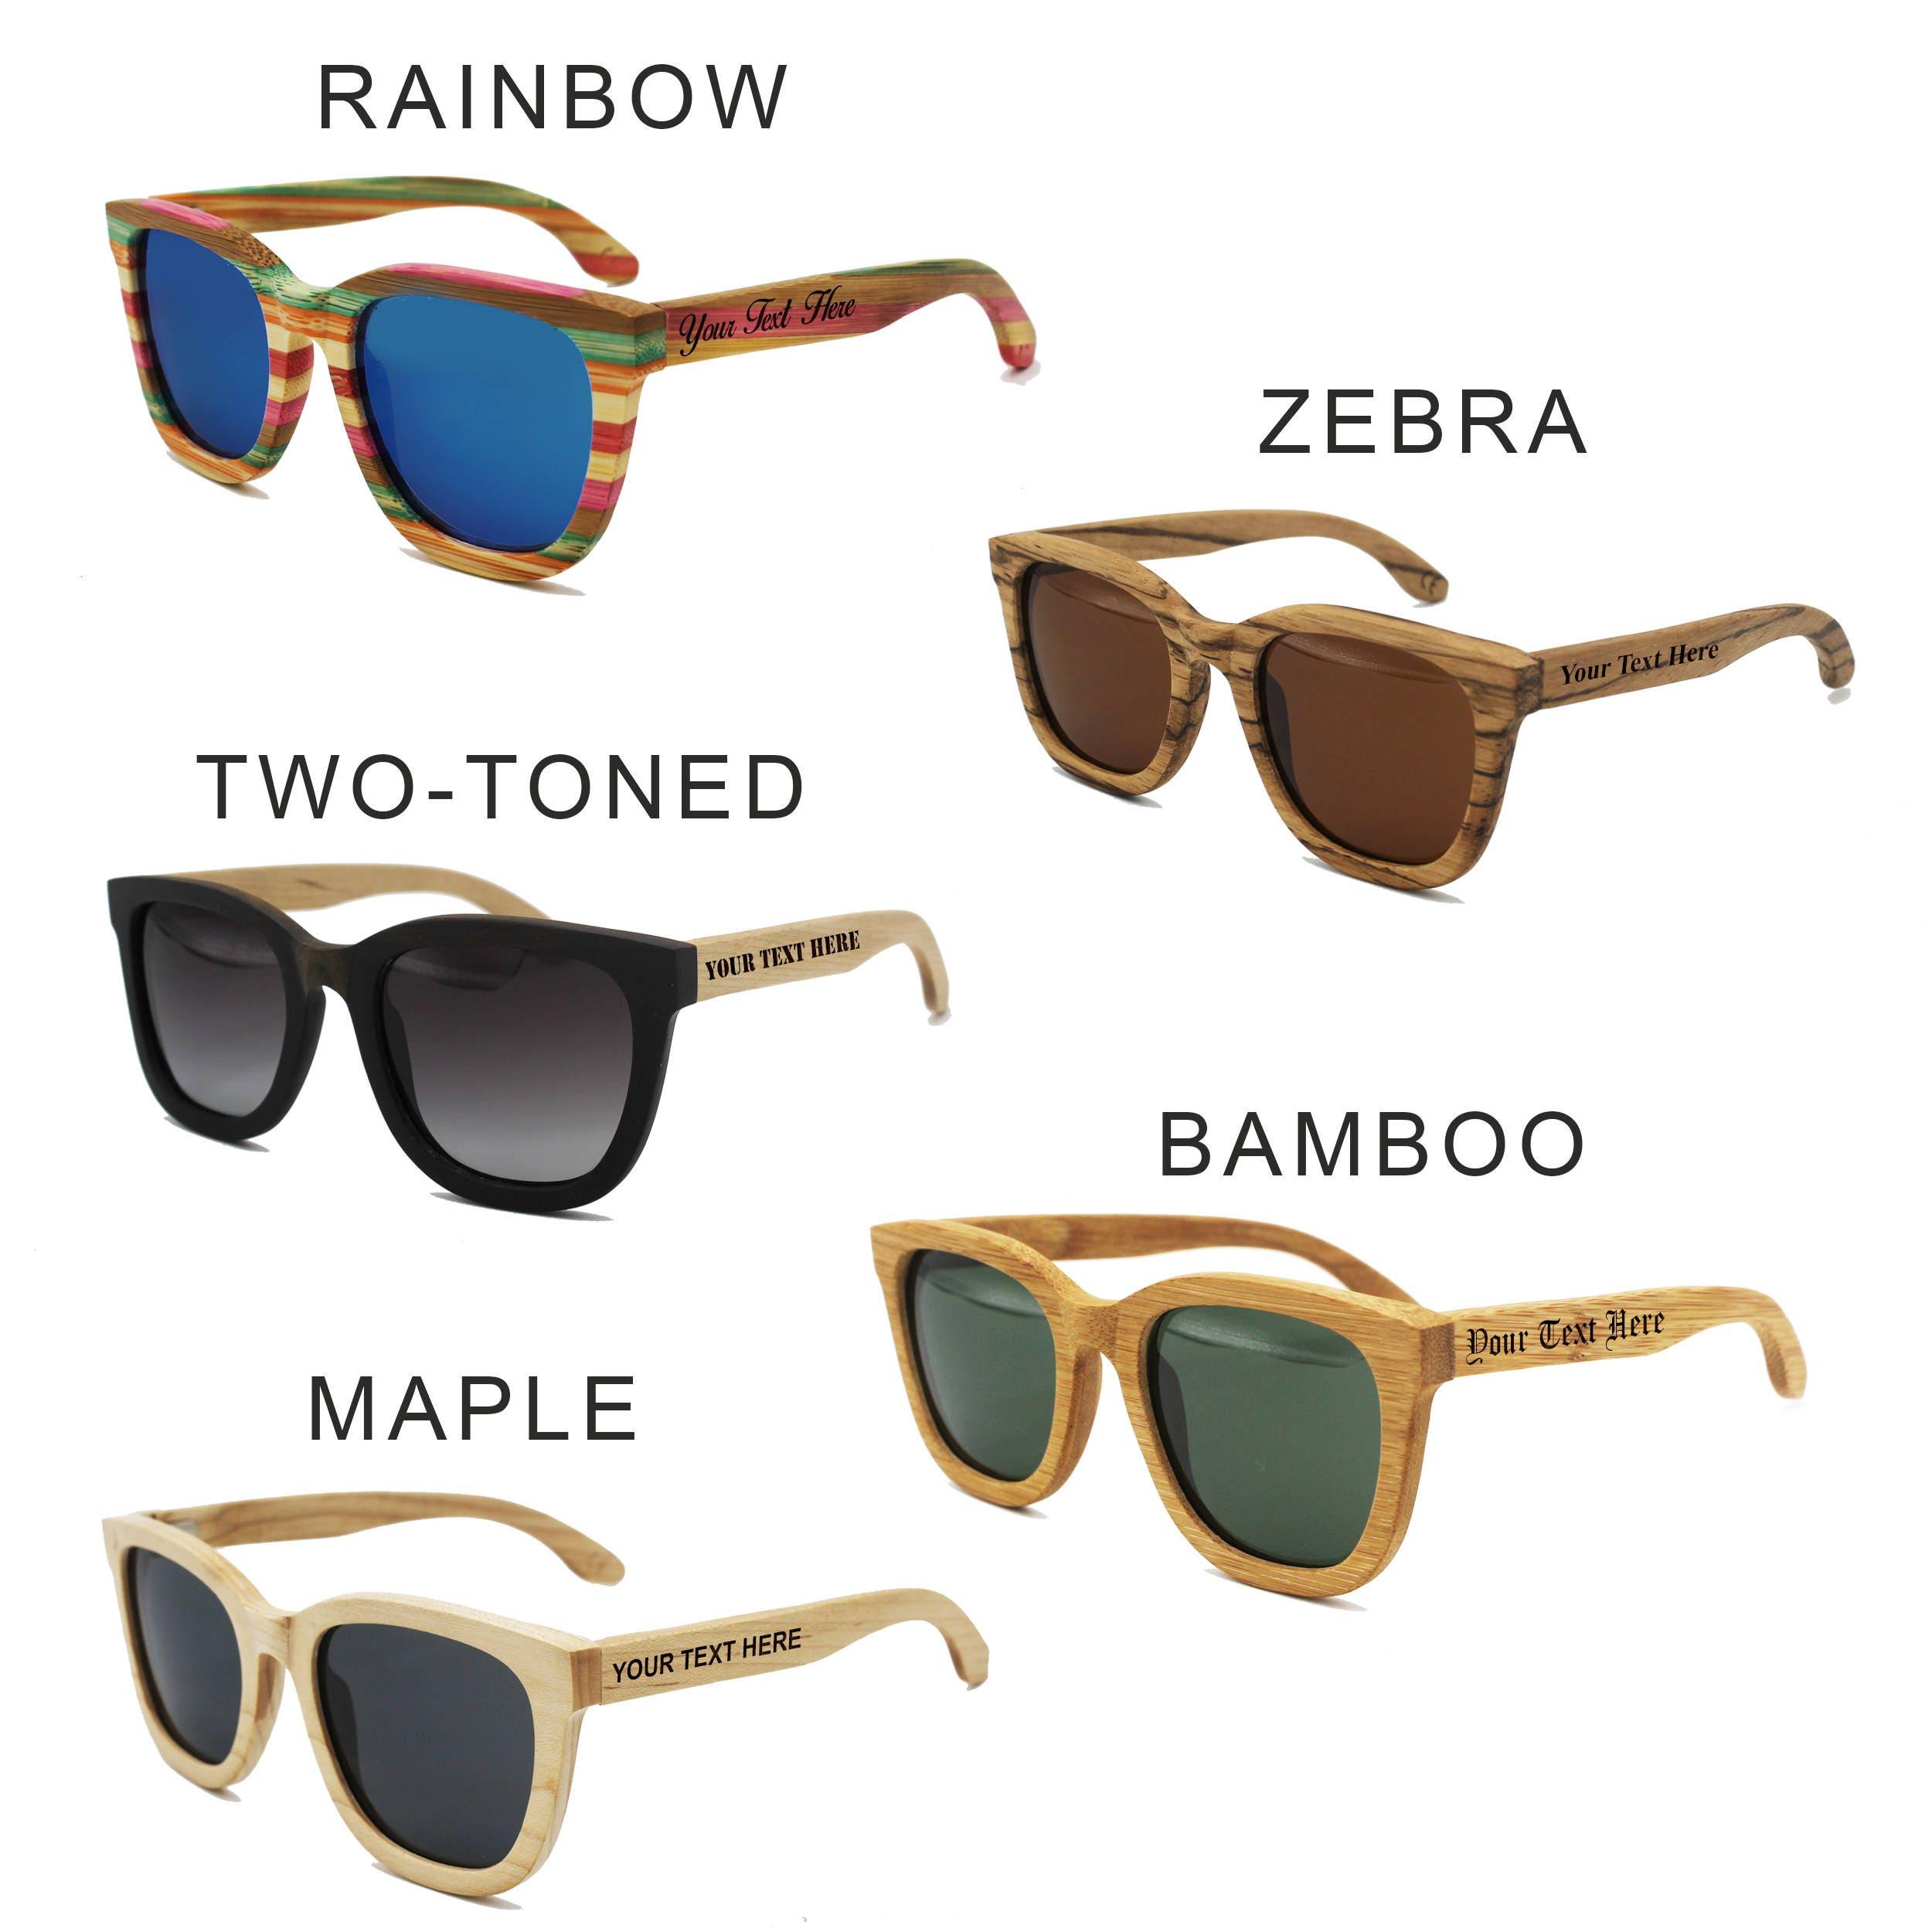 Wedding Party Sunglasses Custom Sunglasses Groomsmen